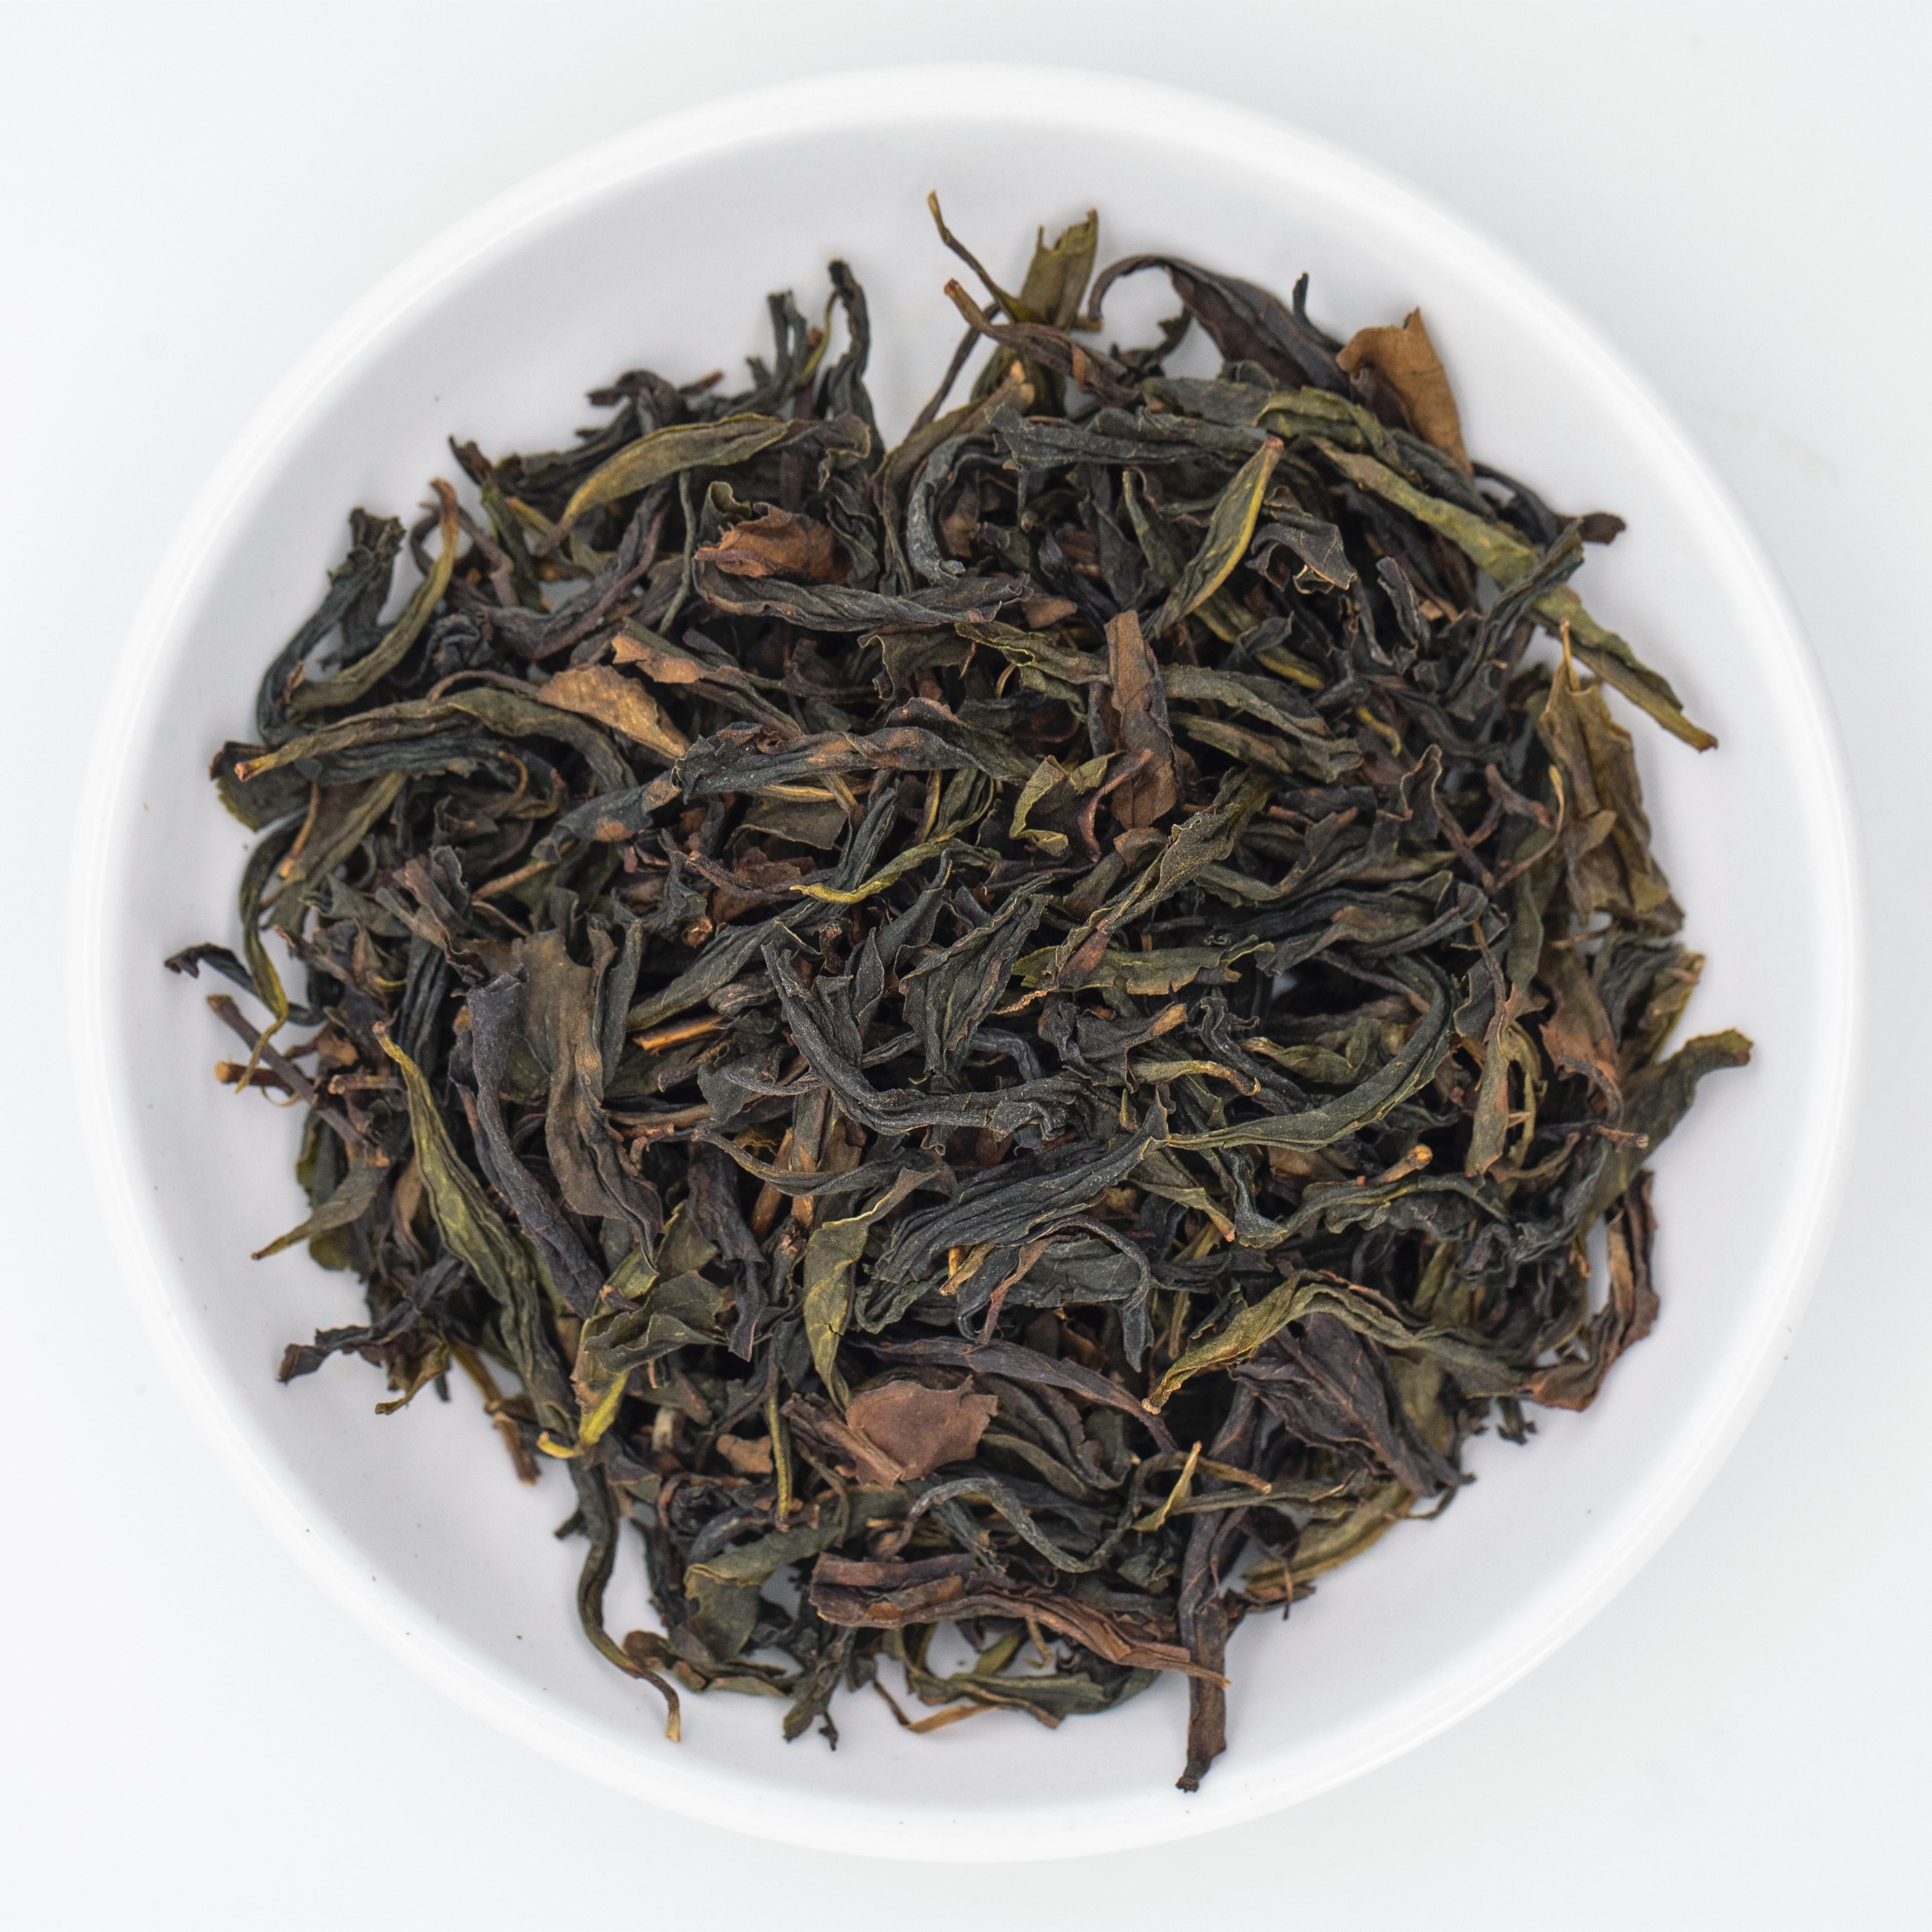 100% Organic shui xian oolong tea slimming tea certified USDA and EC - 4uTea | 4uTea.com